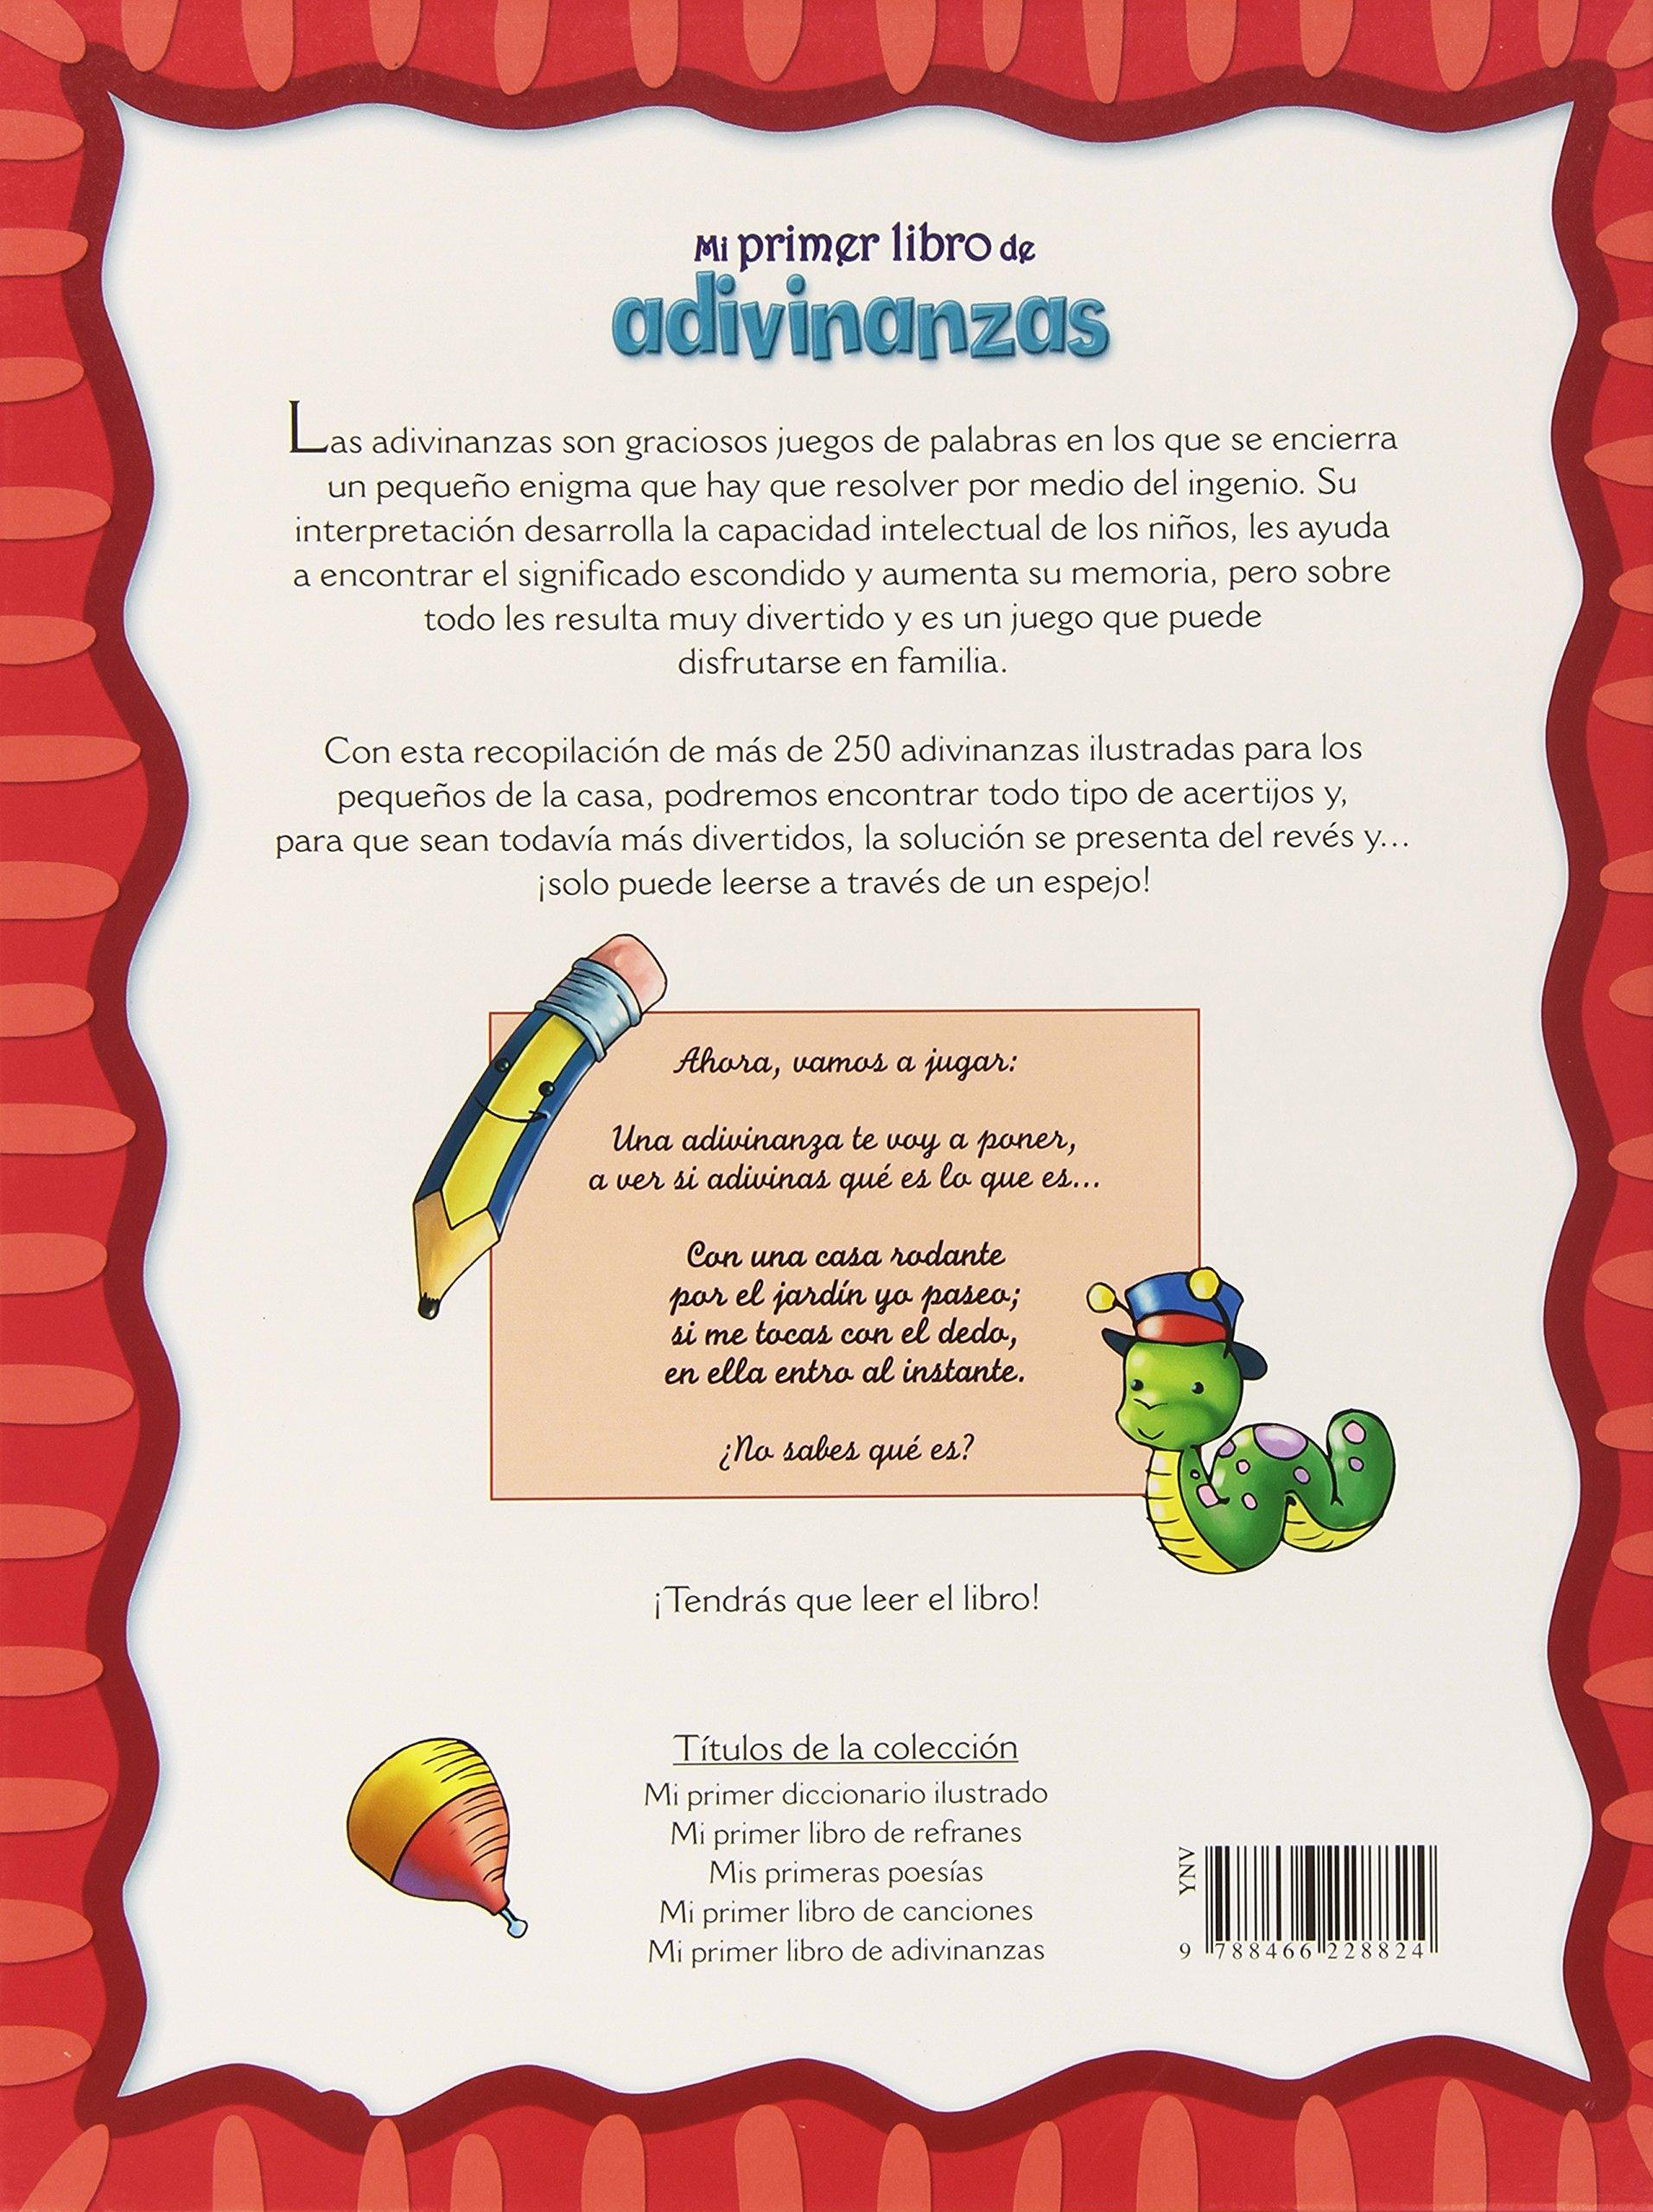 Mi Primer Libro de Adivinanzas (Punto de lectura): Amazon.es: Lucrecia Pérsico: Libros